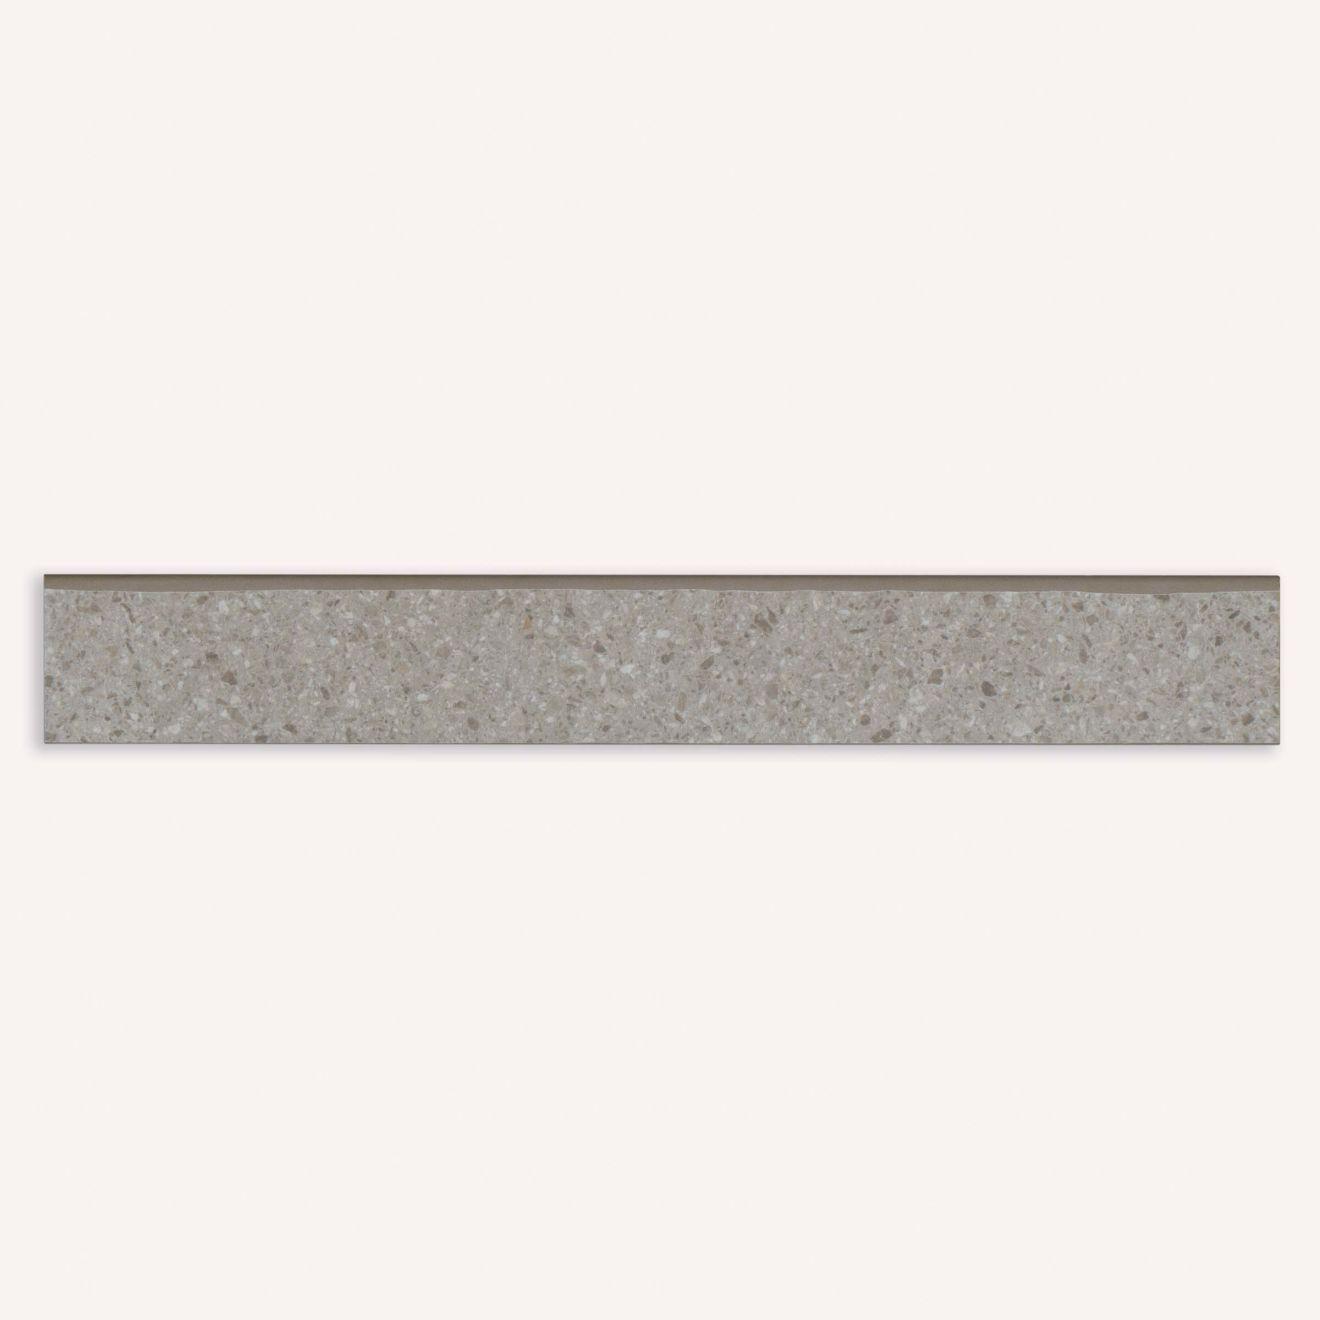 Surface Bullnose 3X20 Light Gray